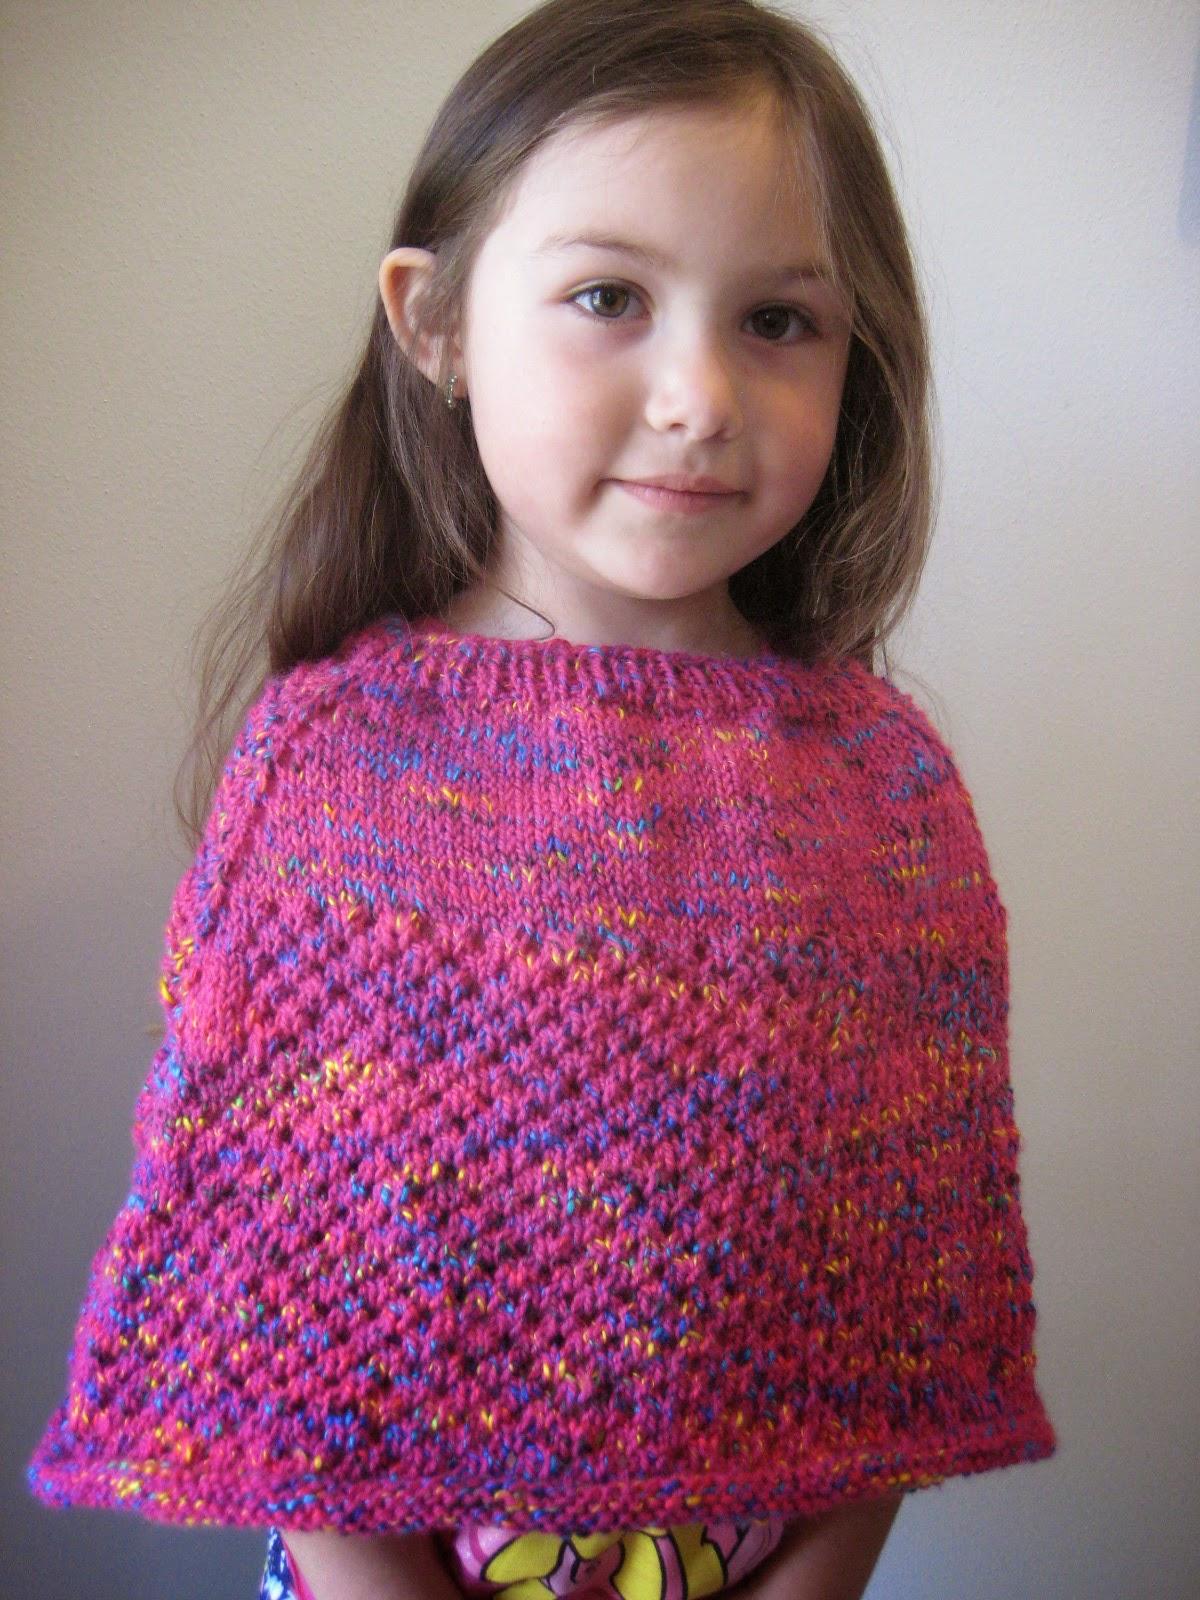 Balls to the Walls Knits: Cellular Stitch Kids\' Poncho